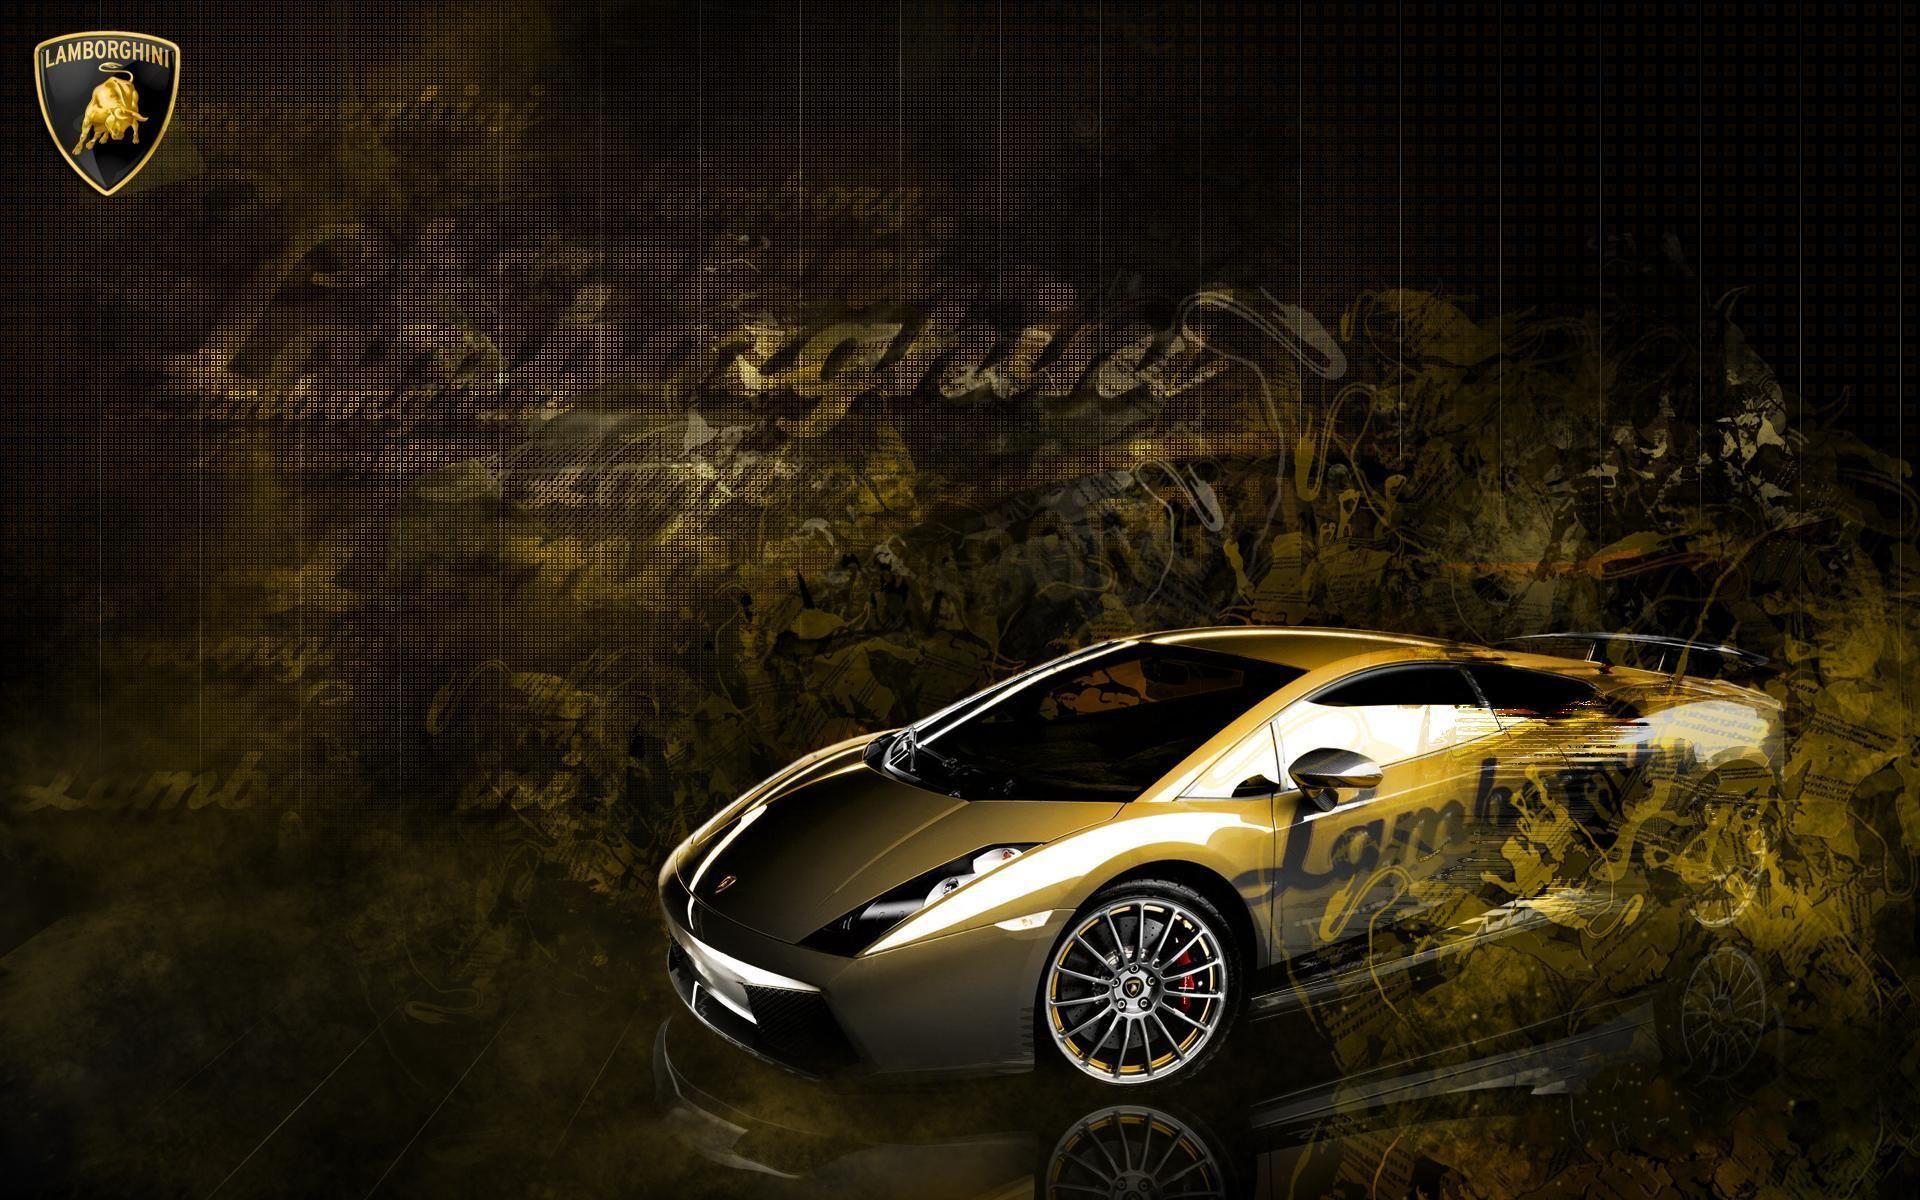 Lamborghini Gallardo Gold CarWallpaper